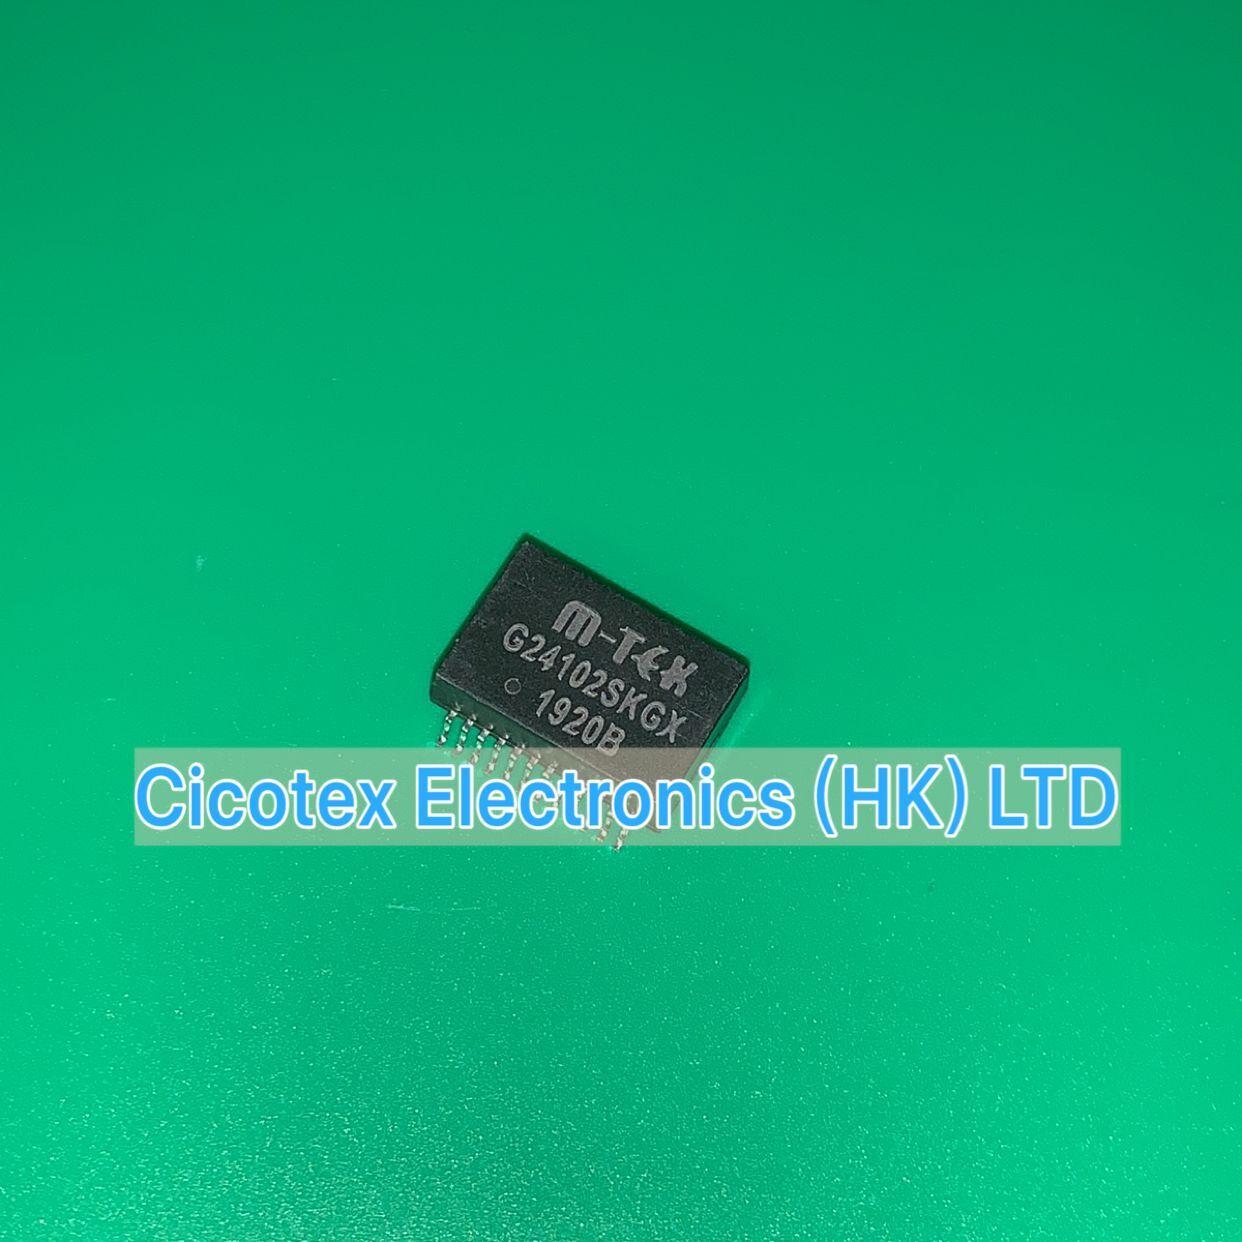 5pcs/lot G24102SKGX SOP24 G24102S KGX NETWORK FILTER TRANSFORMER G24102 SKGX SMD24 24102 G 24102SKGX